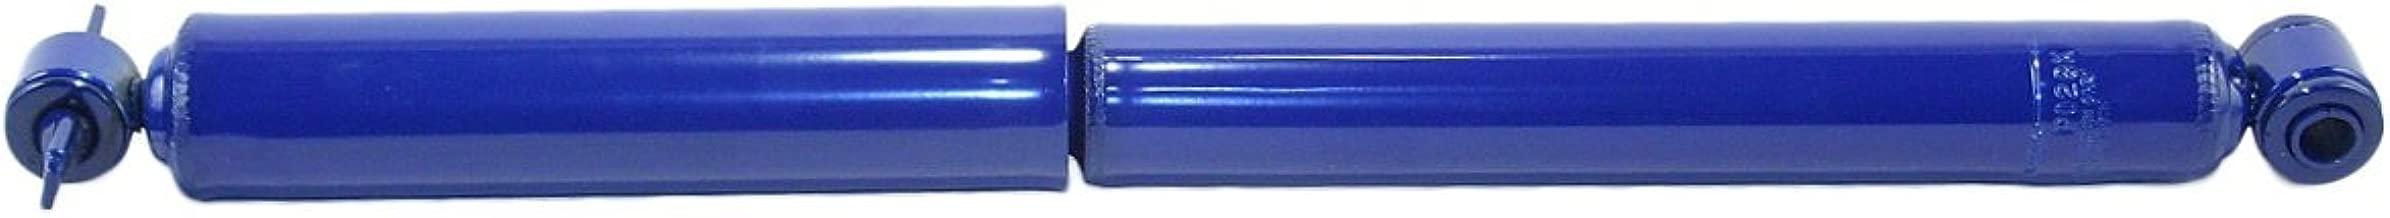 Monroe 32186 Monro-Matic Plus Shock Absorber